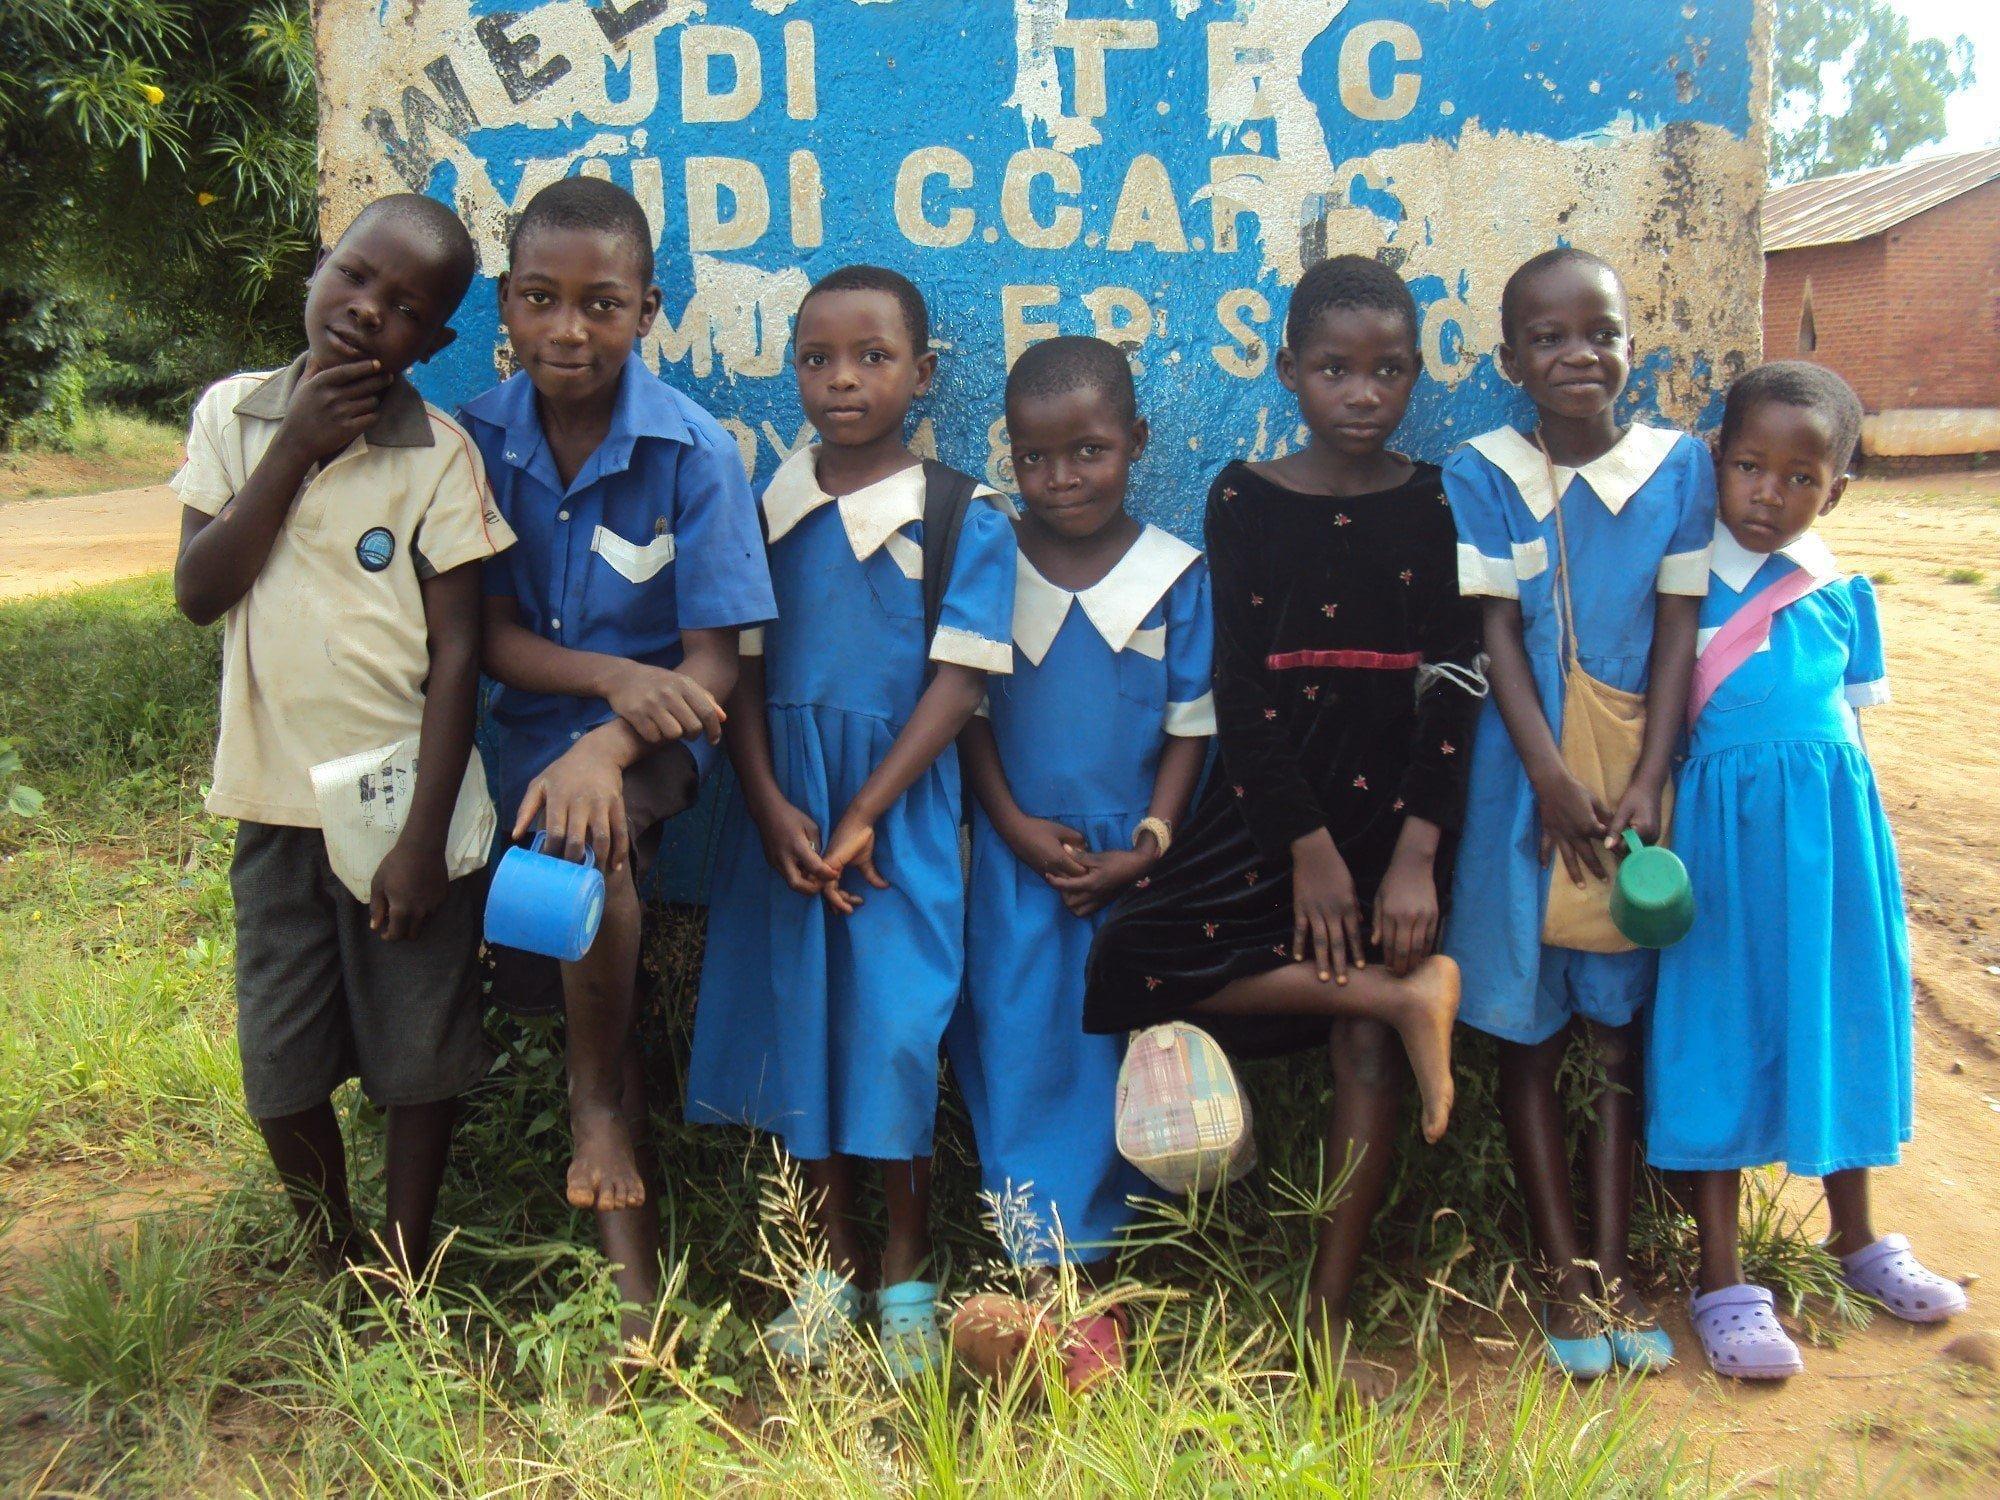 Tuberculosis Education in Malawi